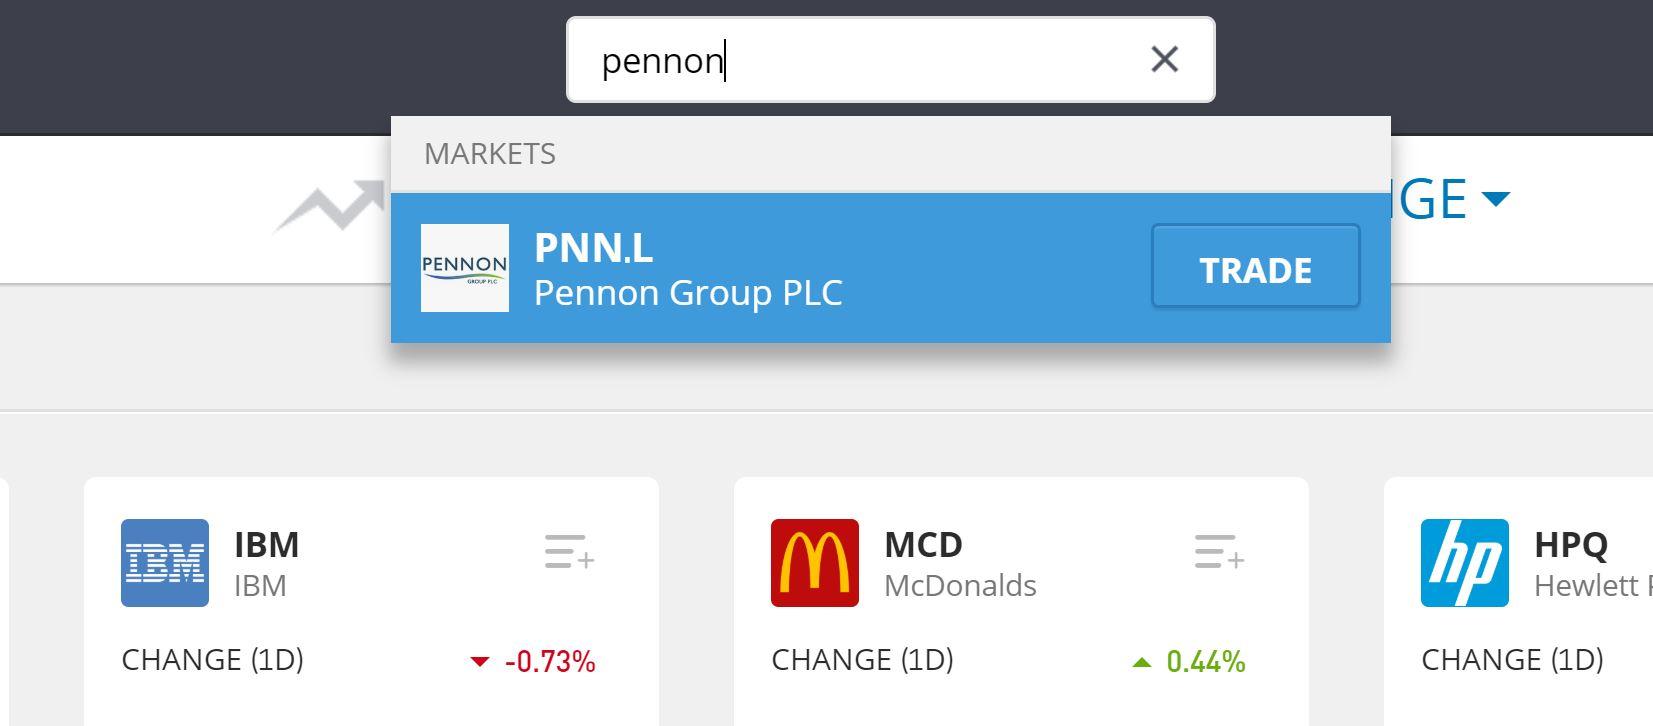 Search for Pennon shares on eToro